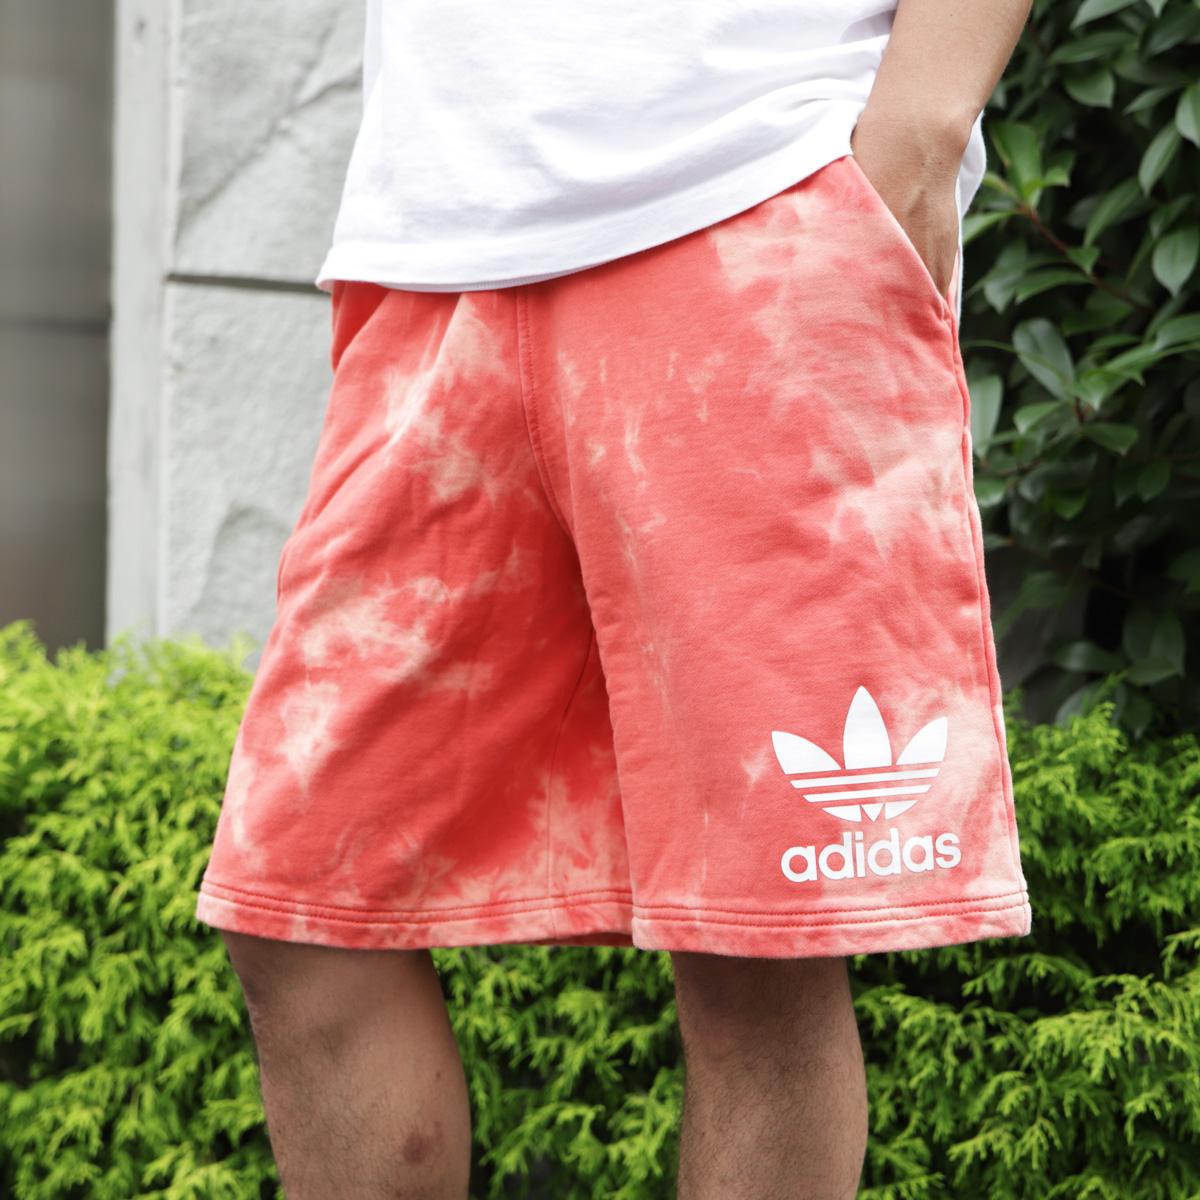 adidas Originals TIE DYE SHORTS (アディダス オリジナルス タイダイ ショーツ) Trase Scarlet【メンズ ショートパンツ】18SS-I